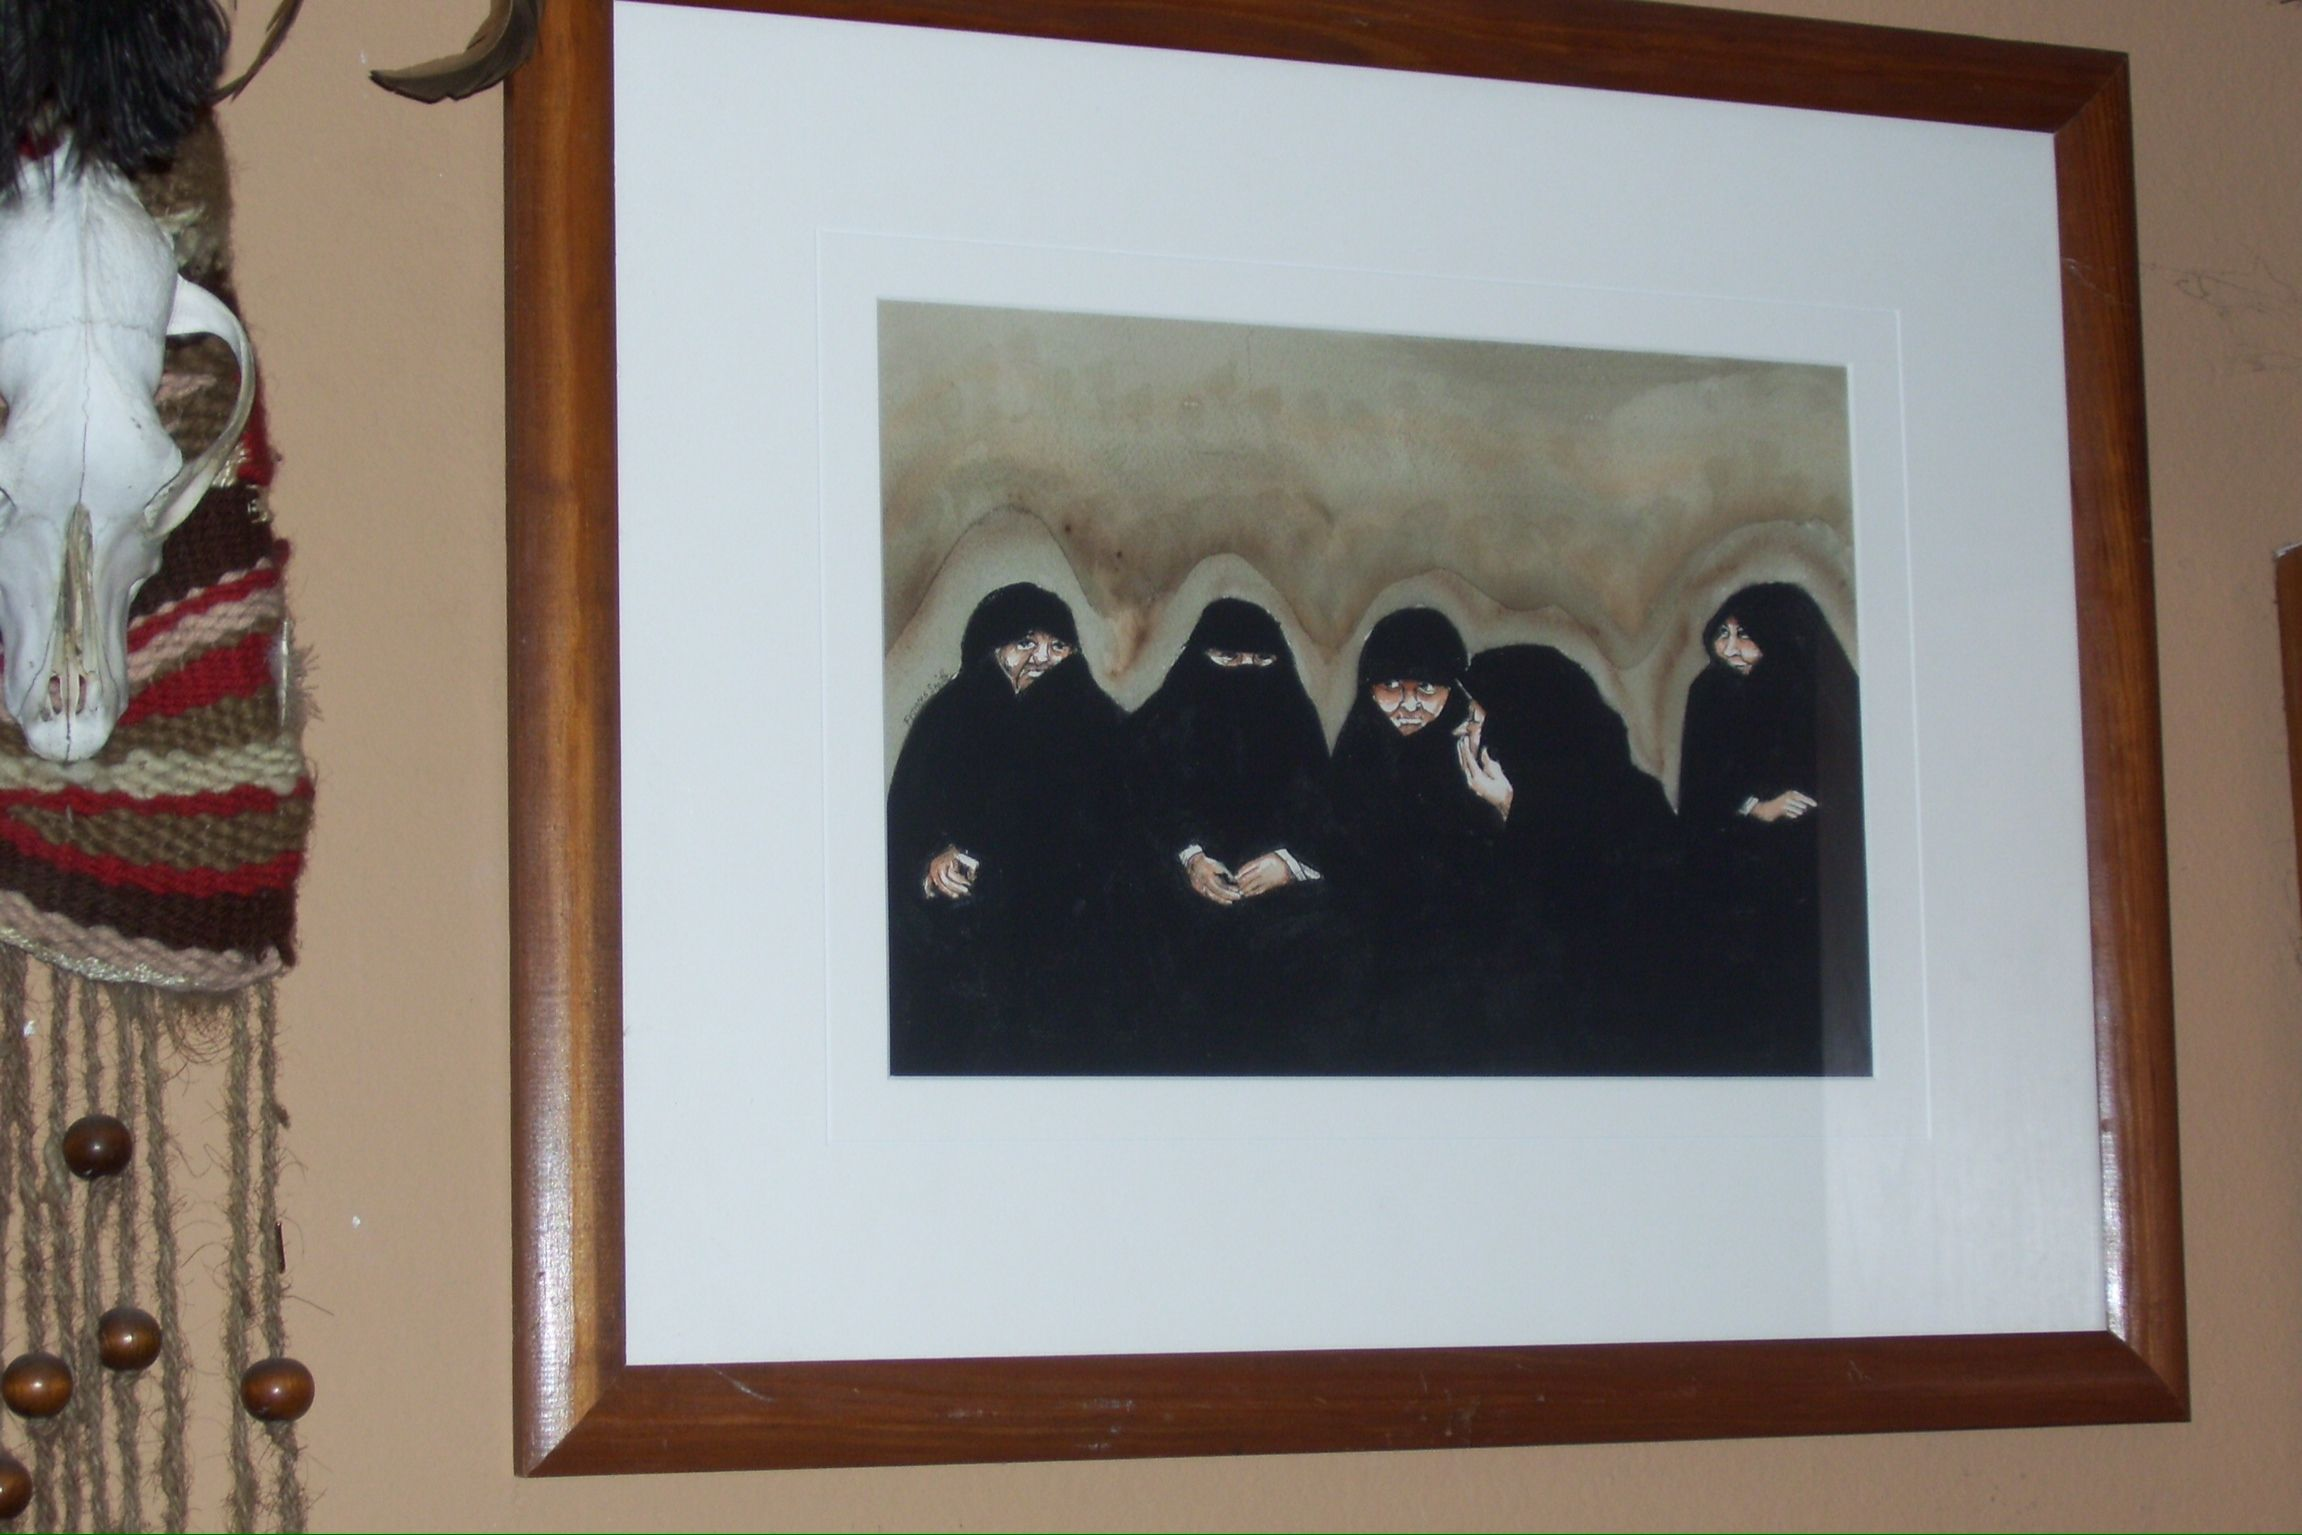 Arab ladies watercolor  by Frances Smith